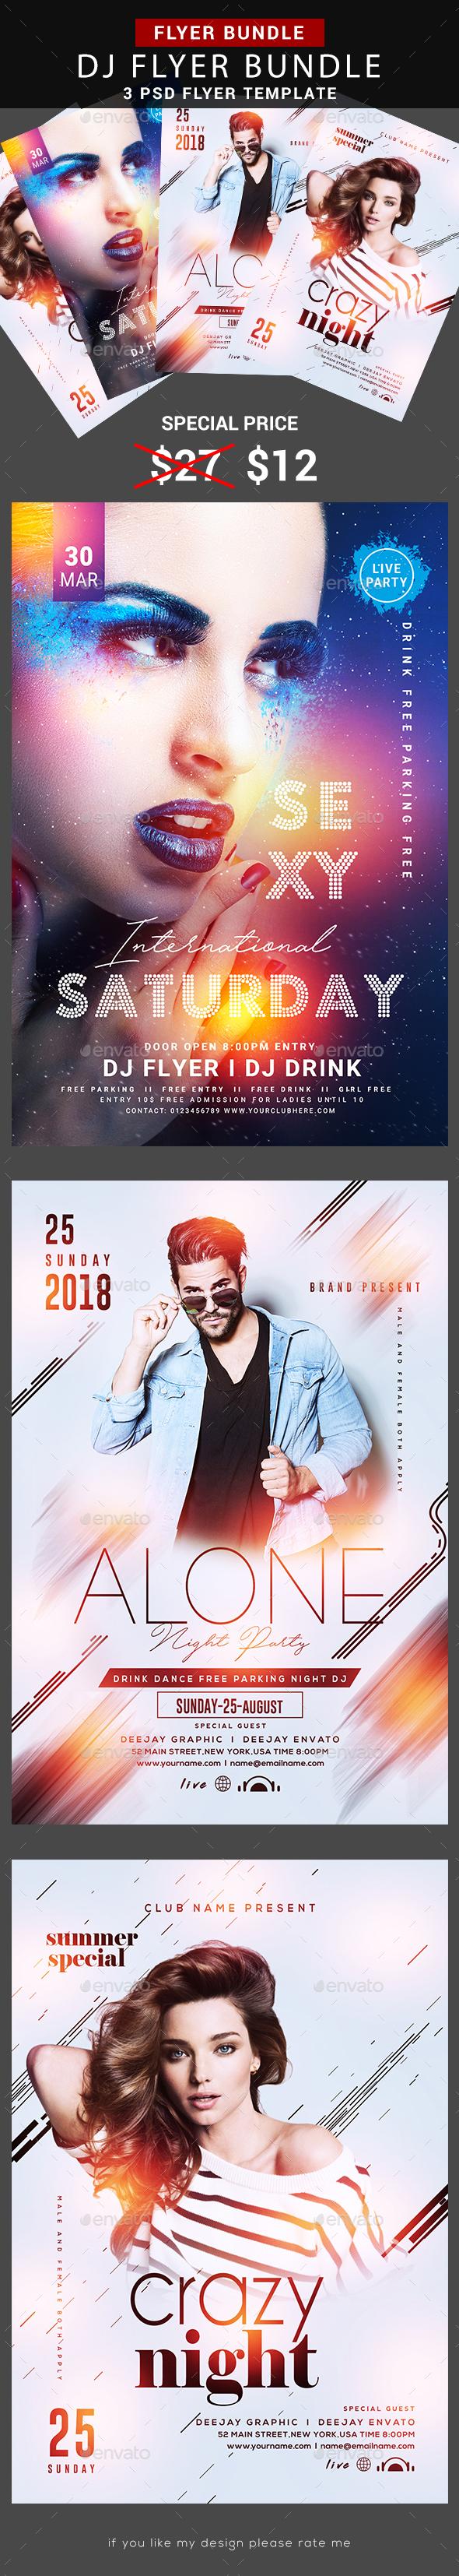 Guest DJ Flyer Bundle - Flyers Print Templates